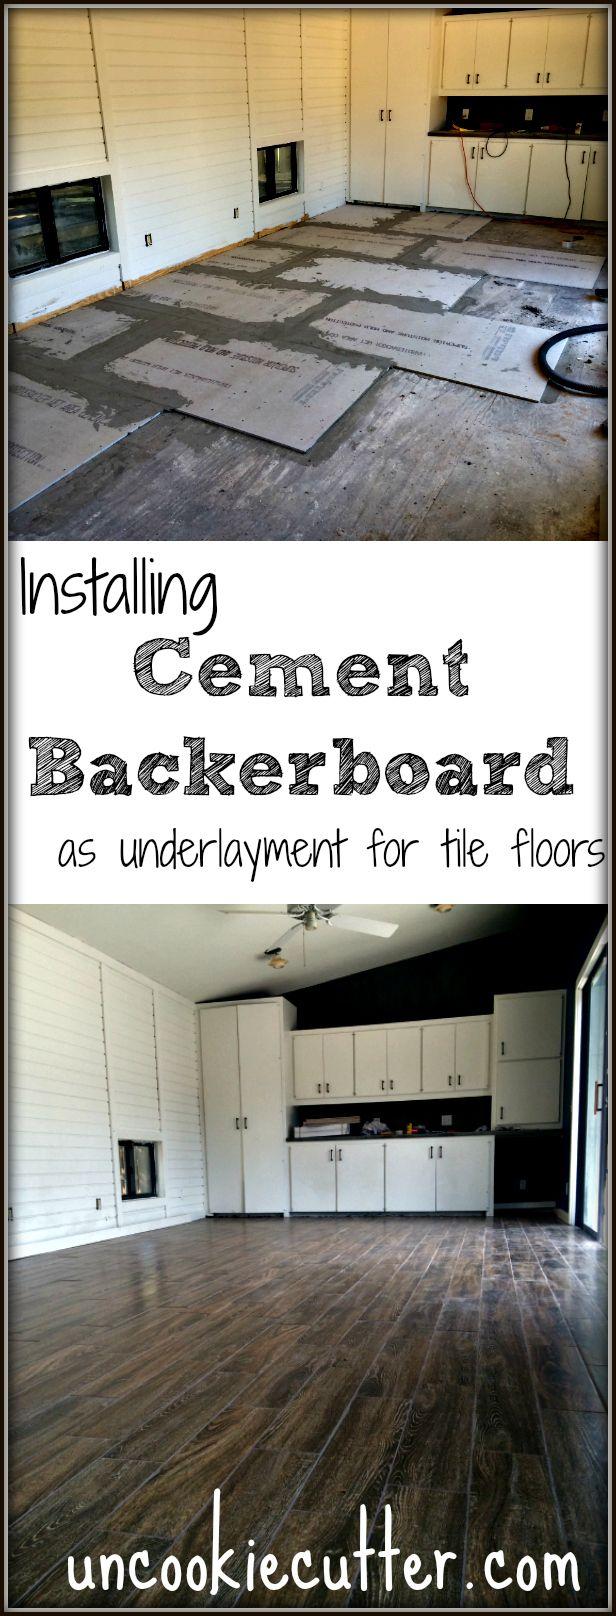 Cement backerboard floor tile installation tile flooring cement backerboard floor tile installation dailygadgetfo Gallery